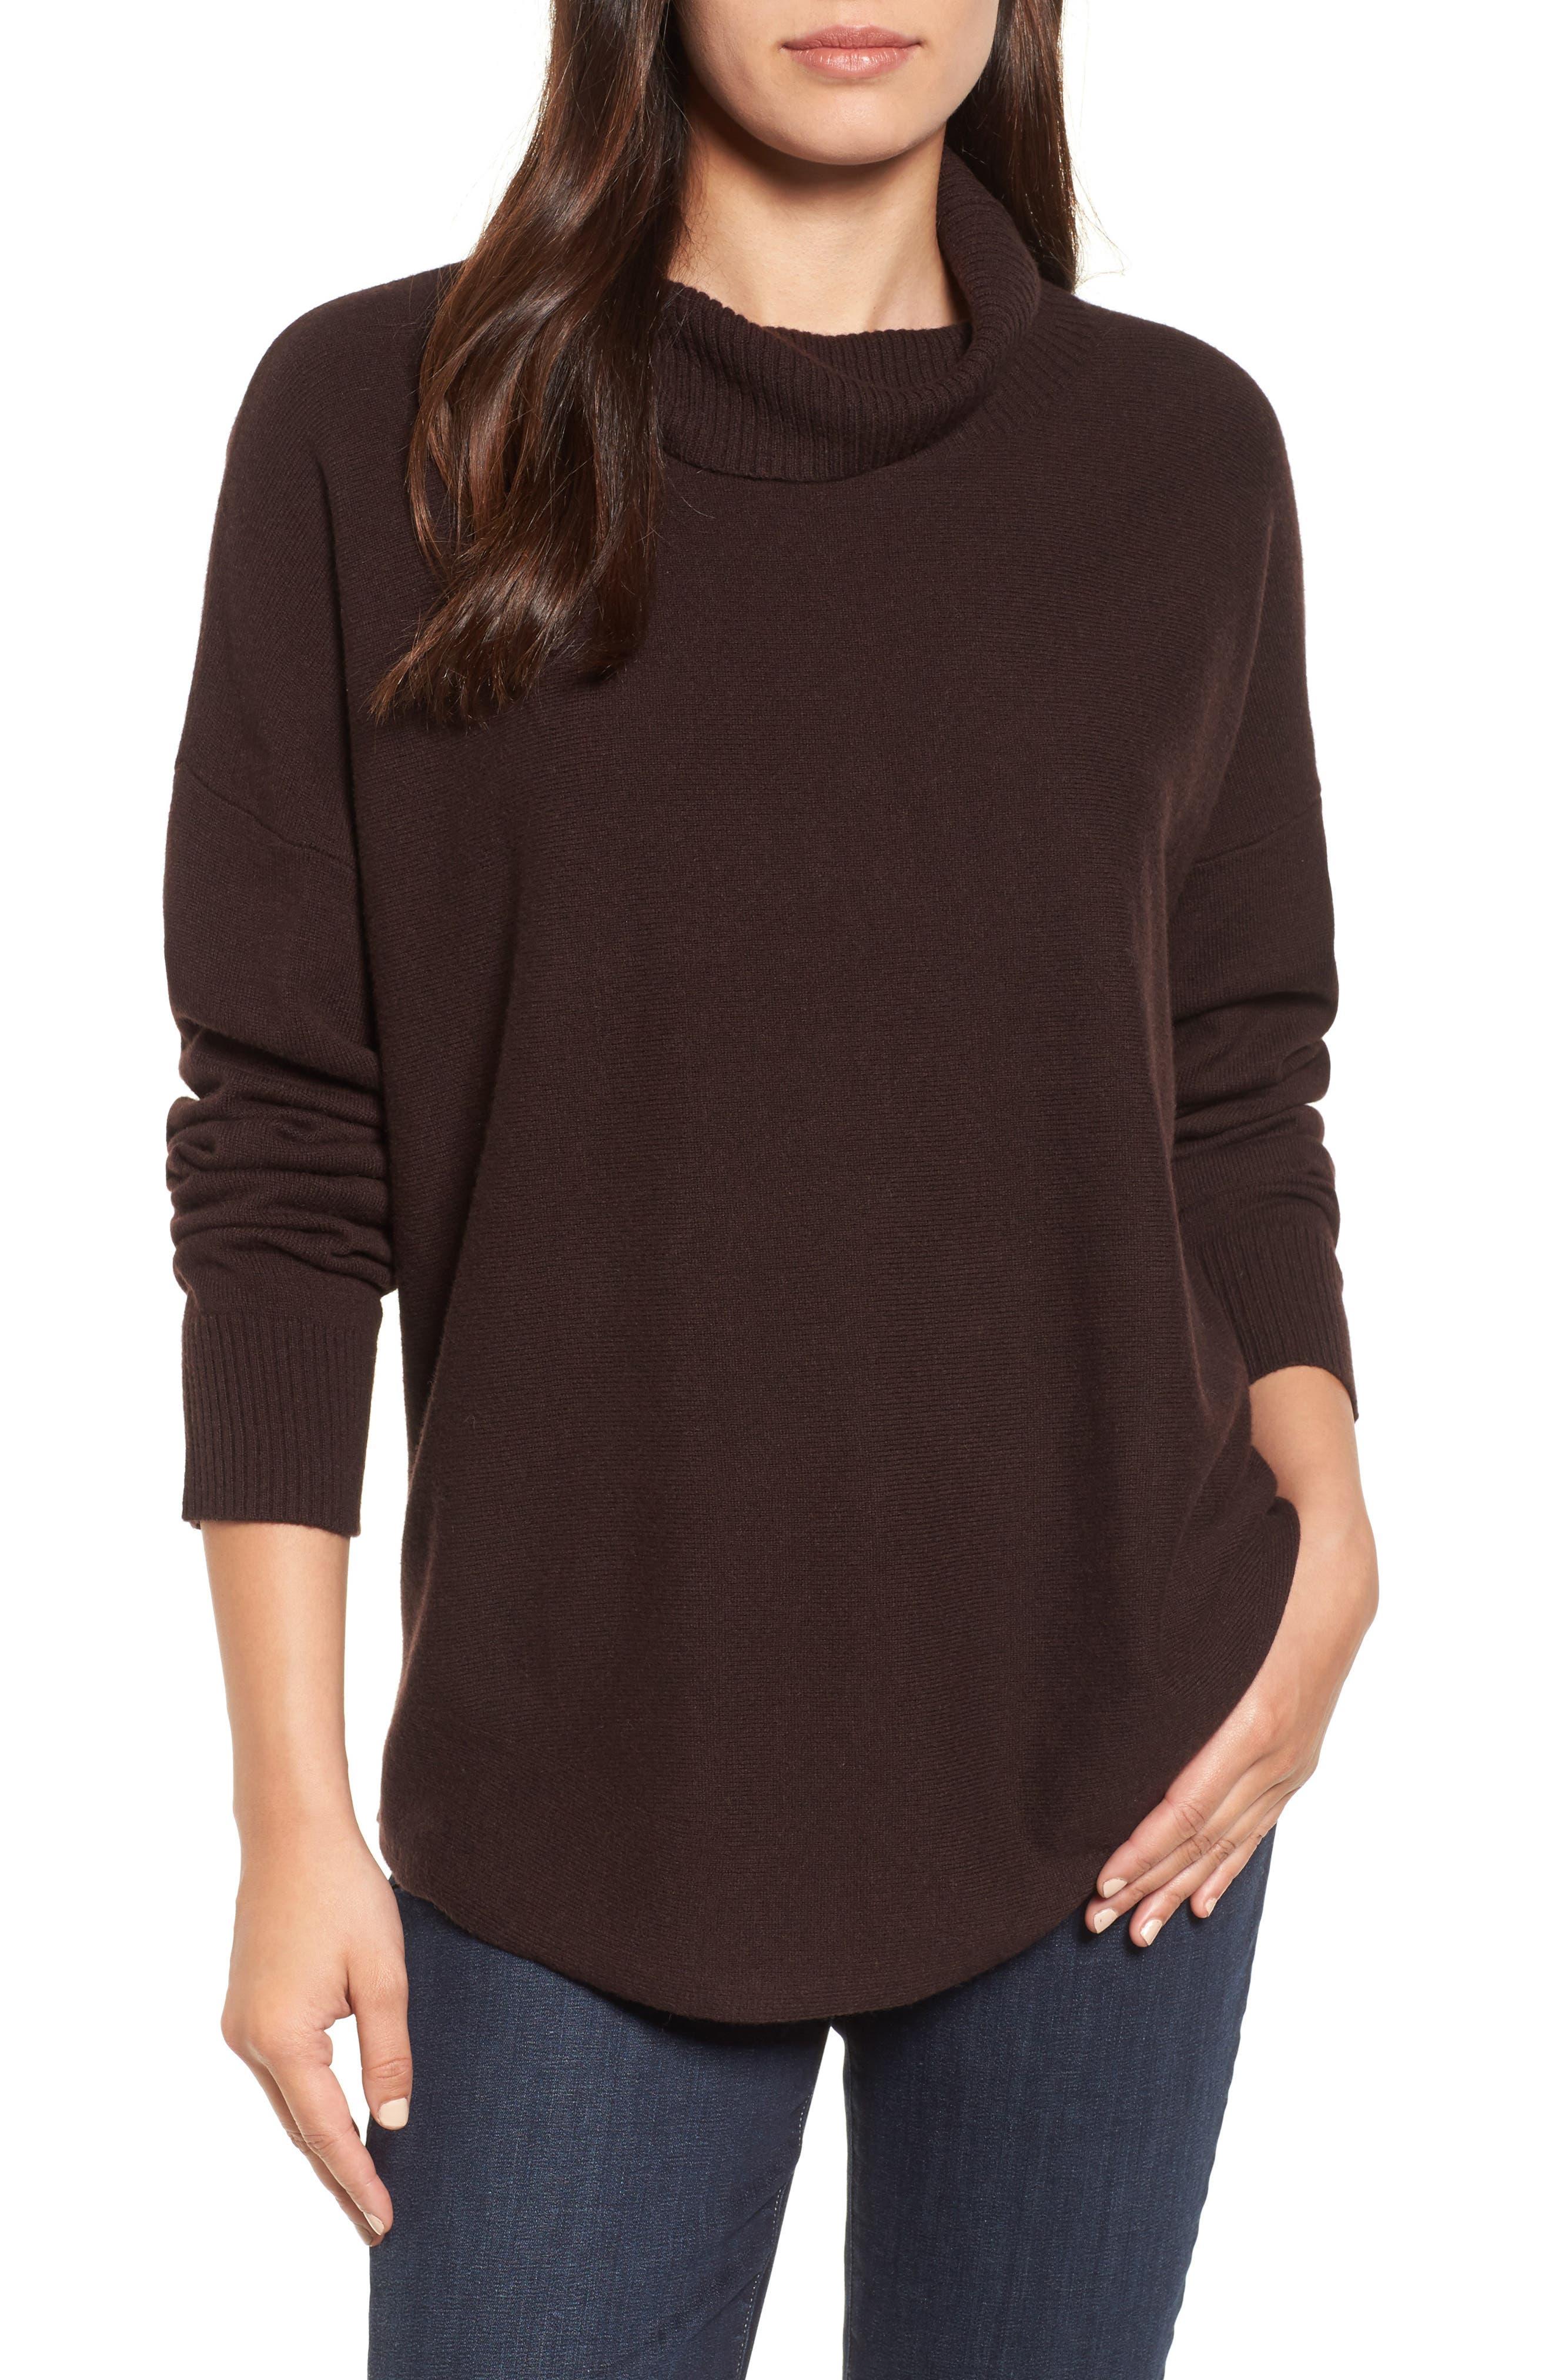 EileenFisher Draped TurtleneckSweater,                             Main thumbnail 1, color,                             211